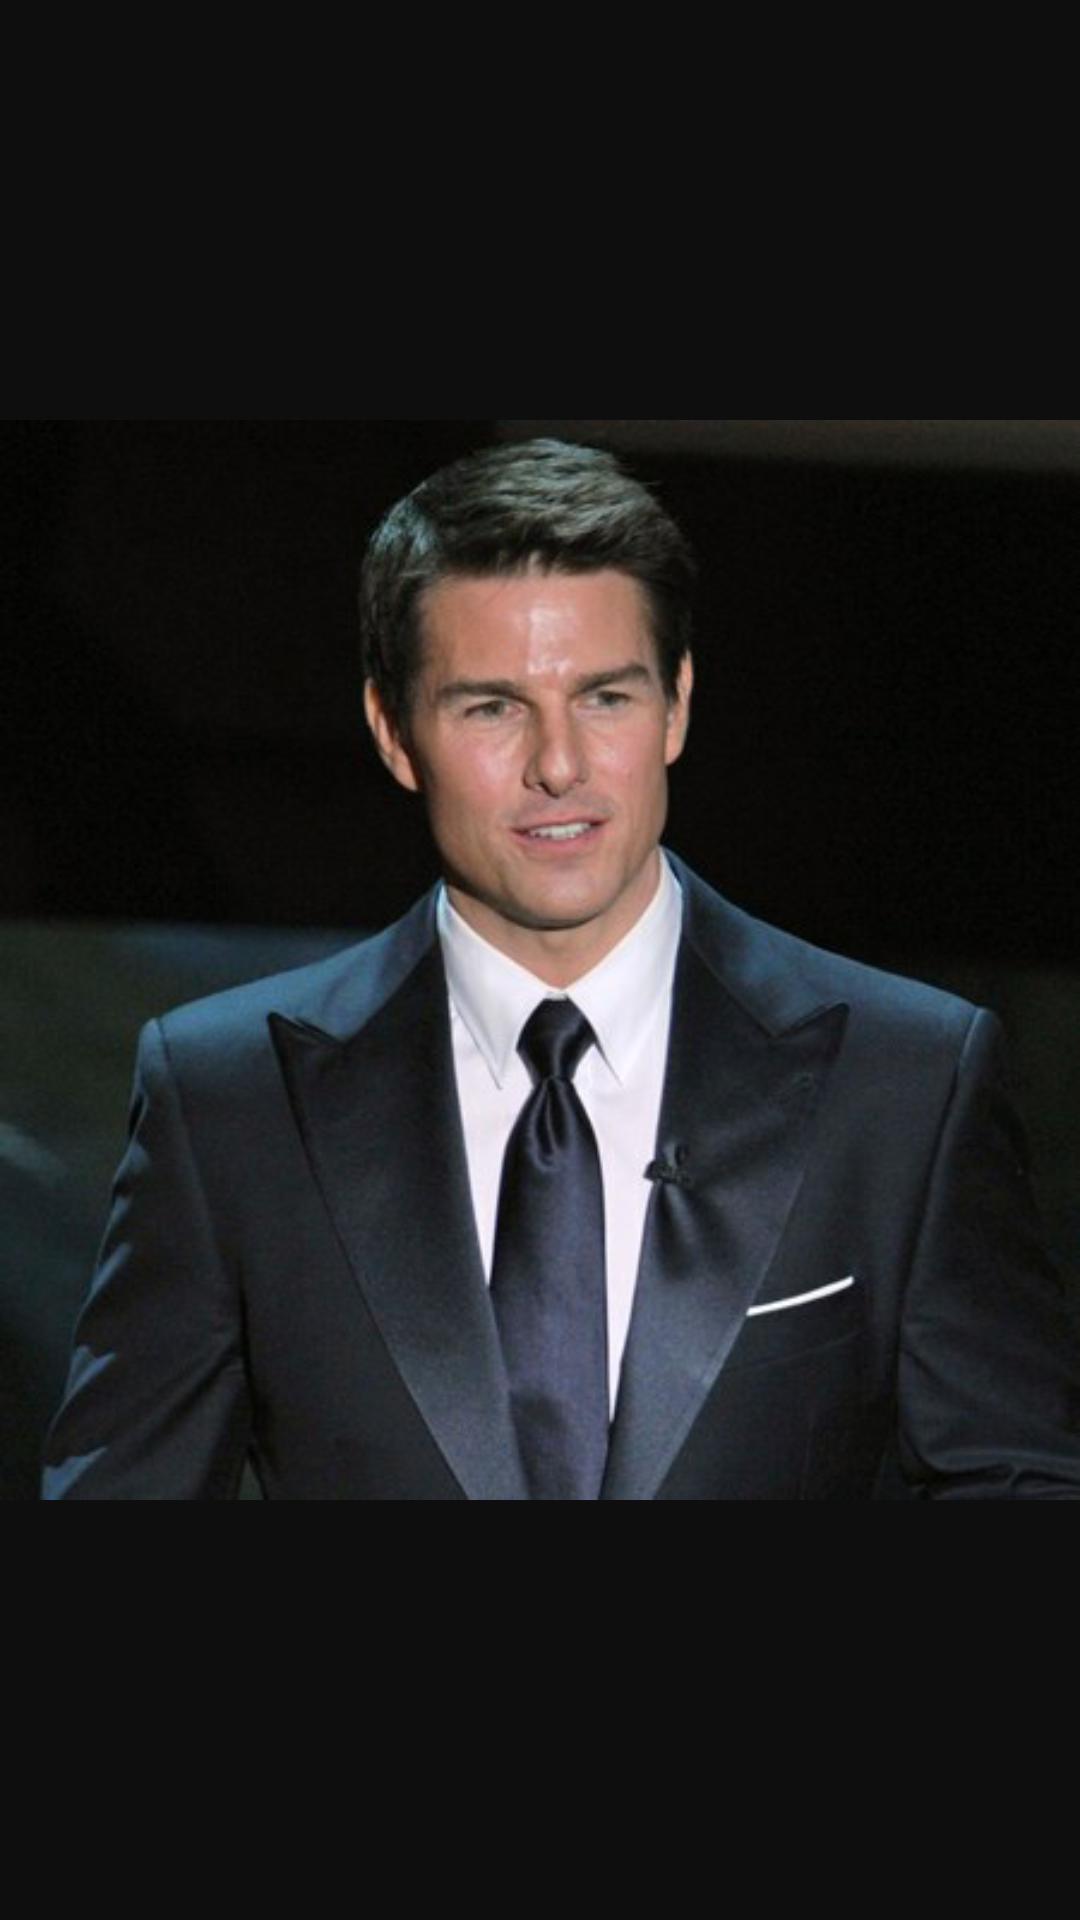 Pin By Kali On Places To Visit Tom Cruise Cruise Joker Heath